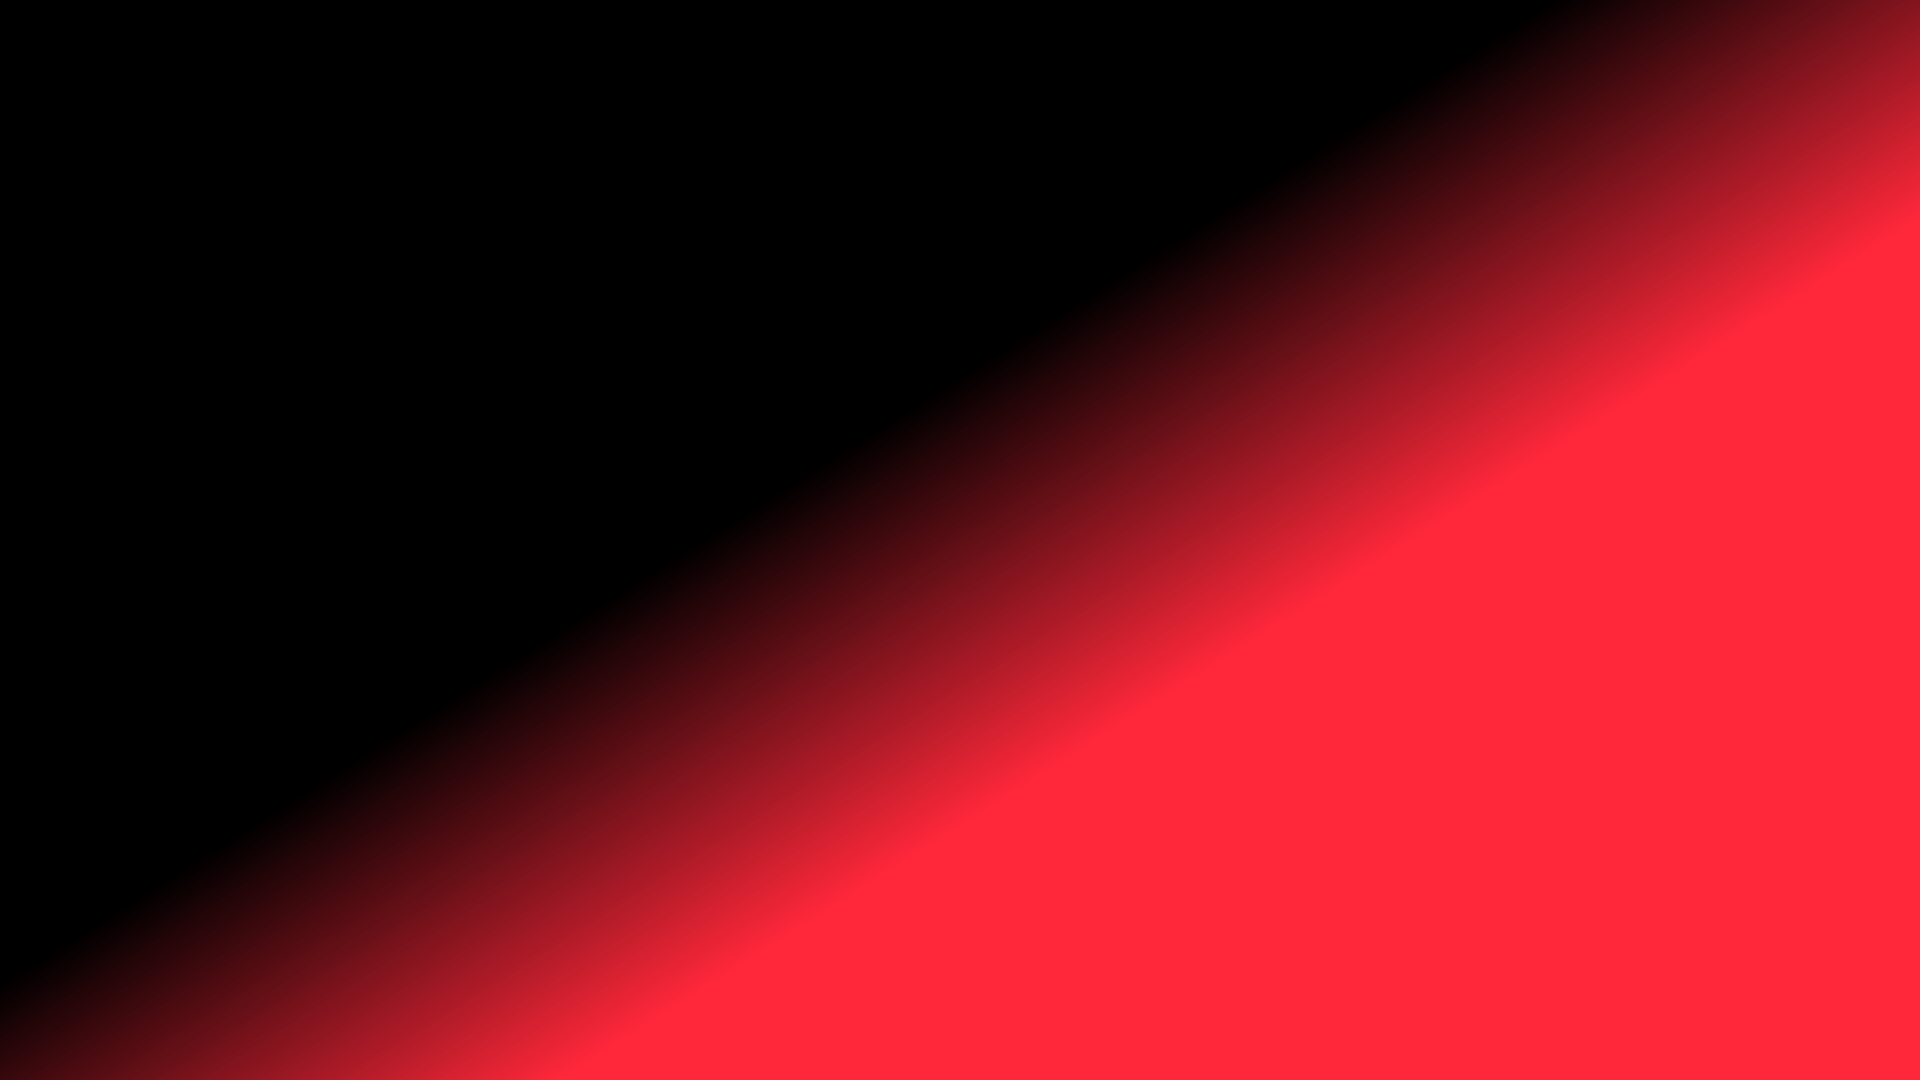 Nothing found for Peach pink black gradient desktop wallpaper 1920x1080